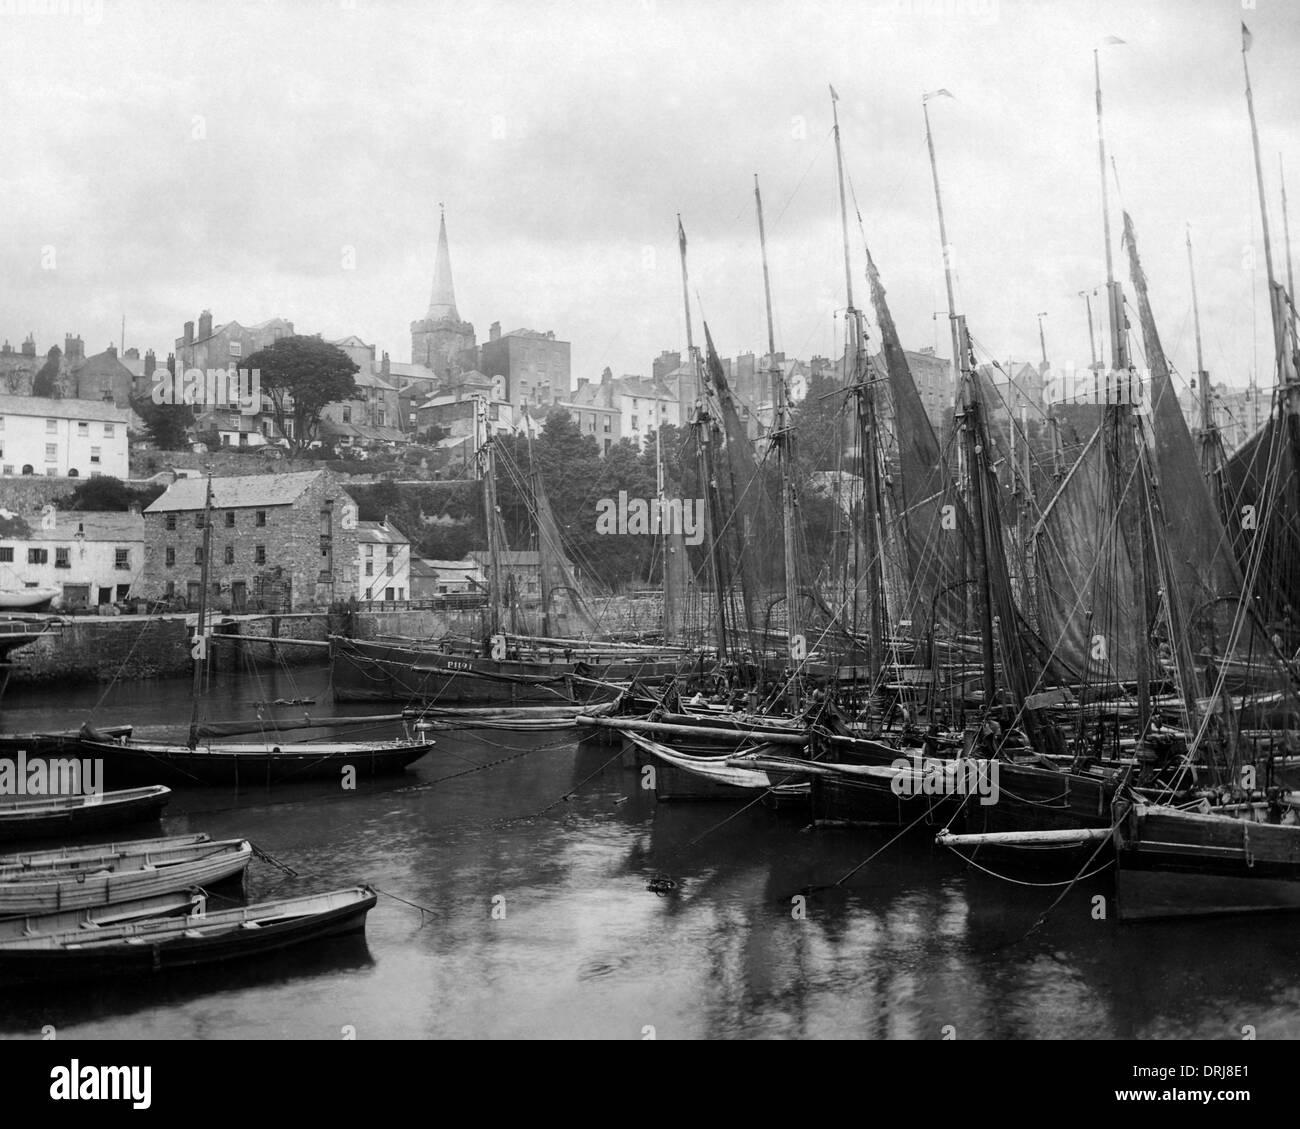 Unnamed English fishing port - Stock Image